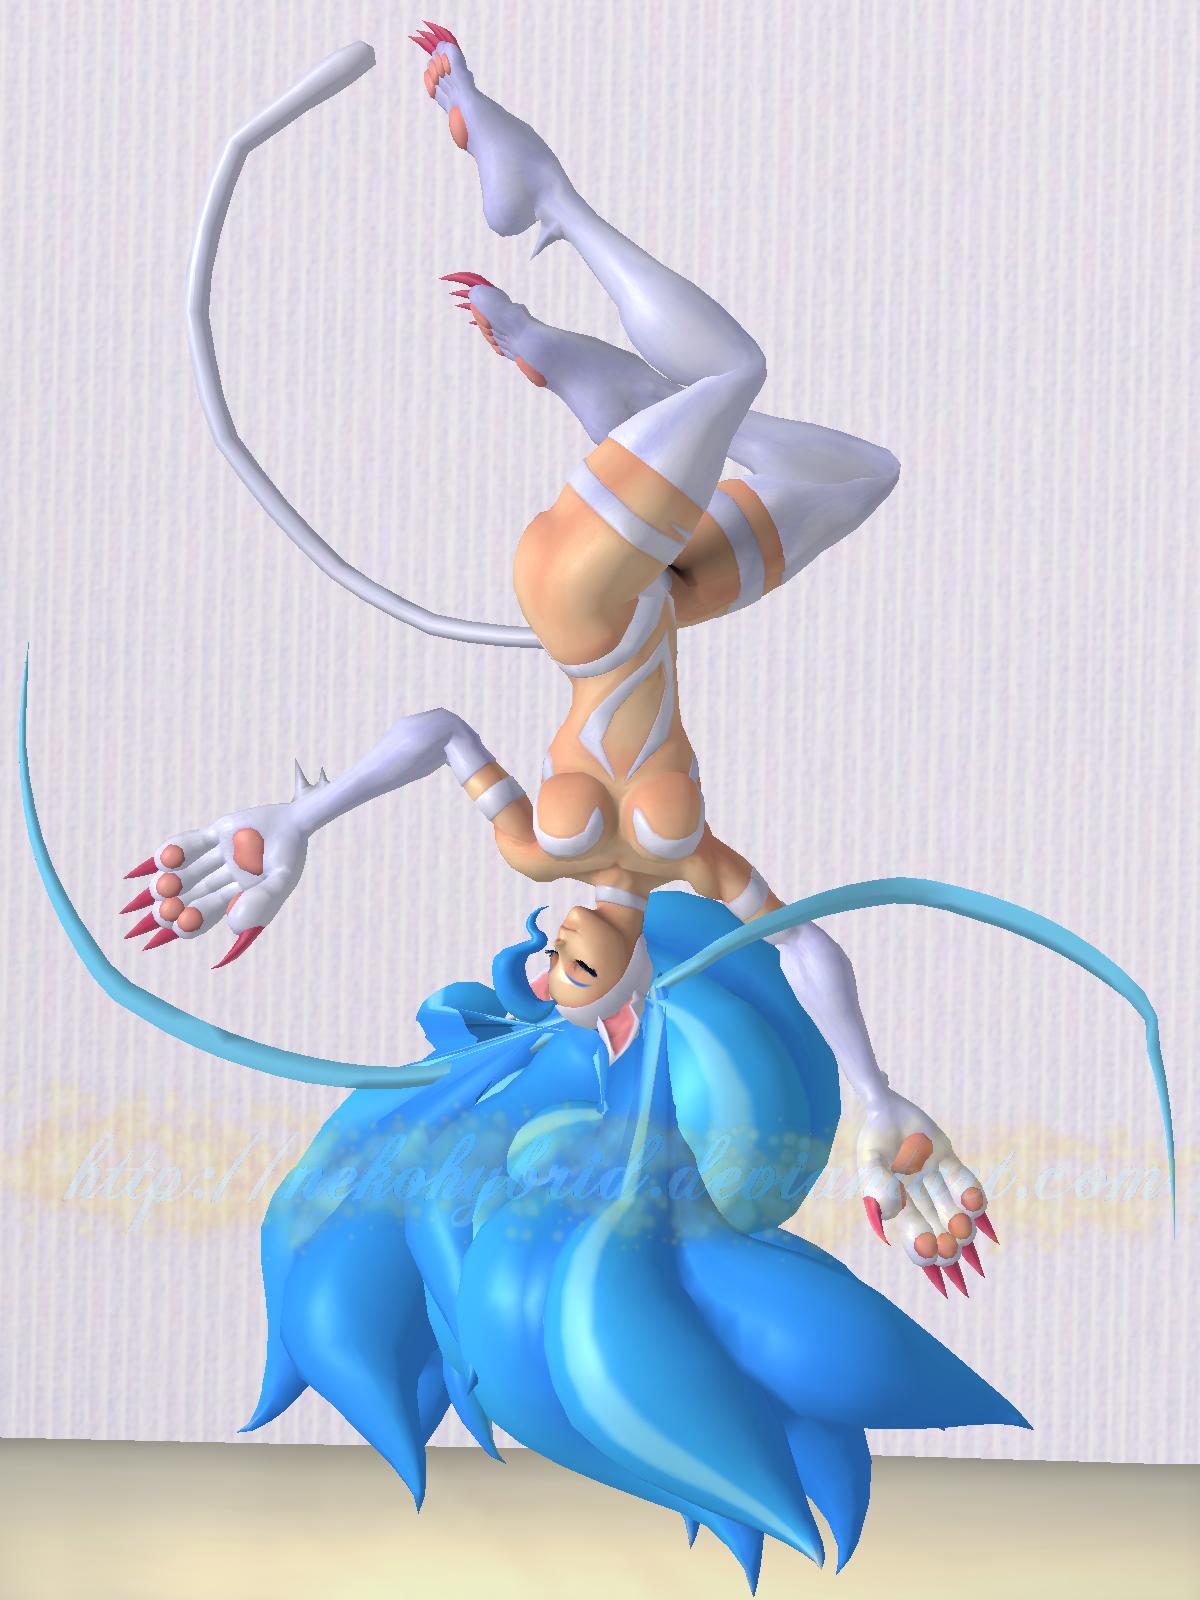 Felicia Sleeping Seductively 3.0 by NekoHybrid